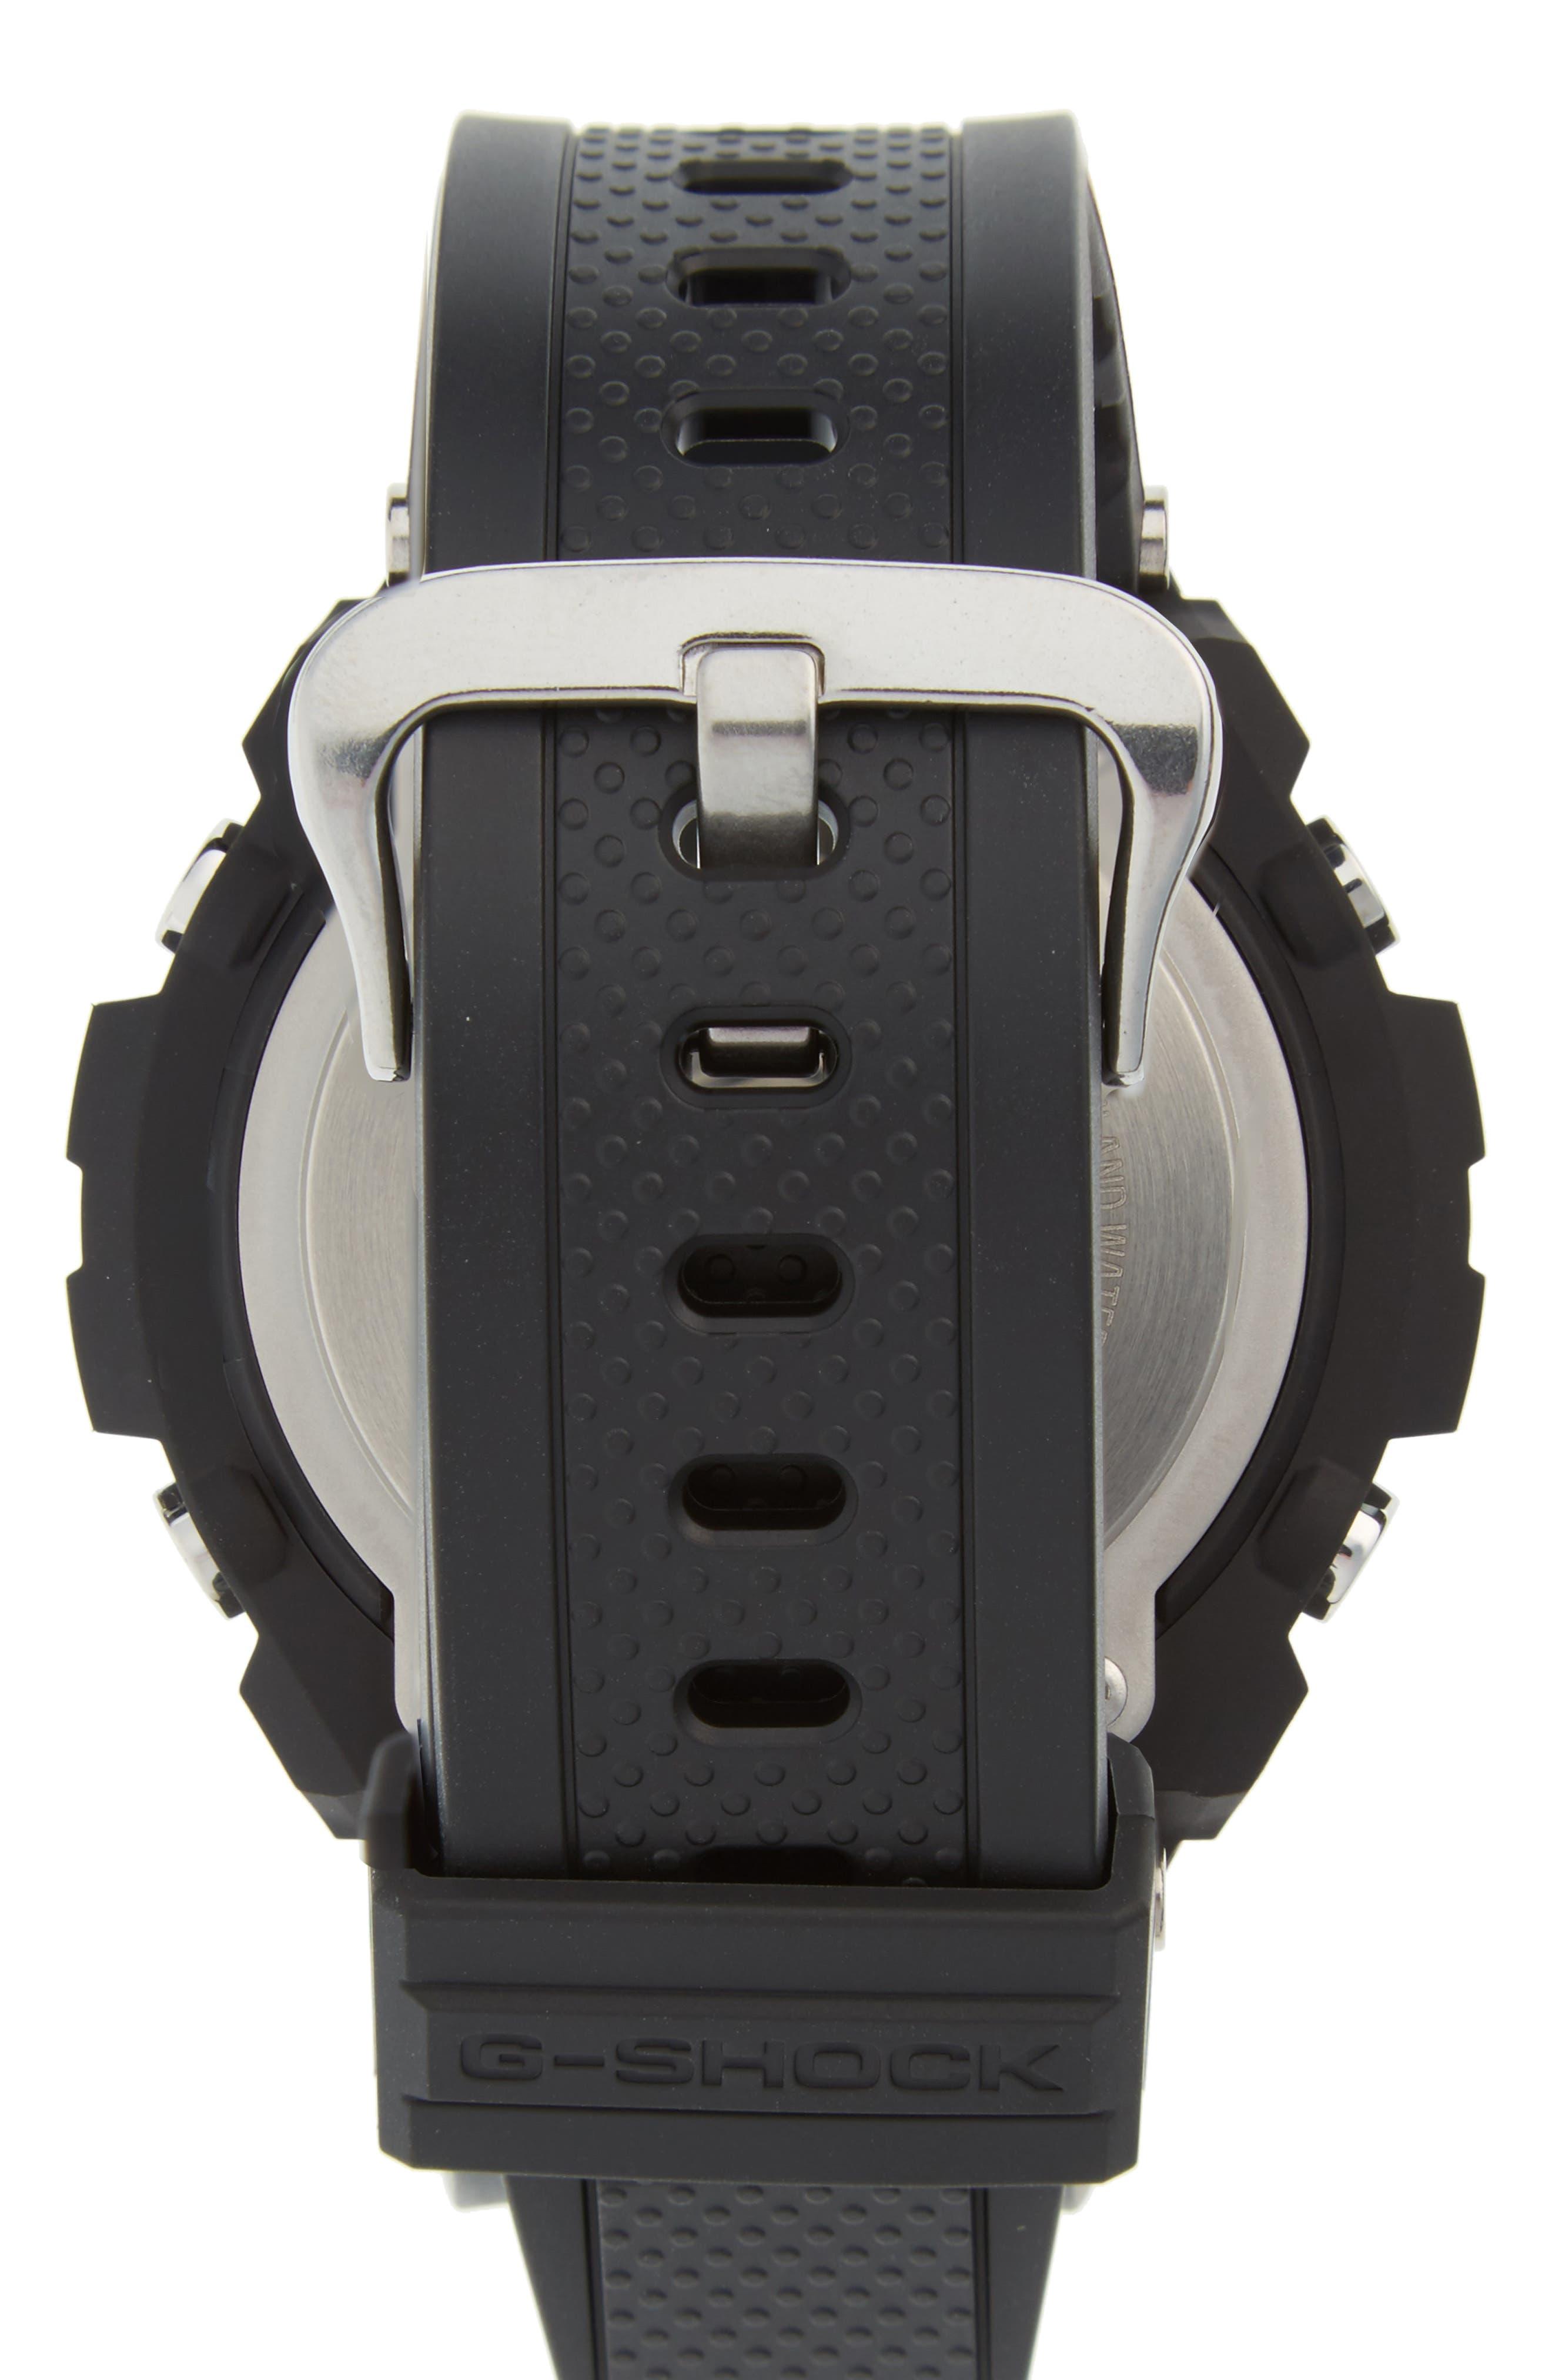 G-SHOCK BABY-G, G-Shock 'G-Steel' Ana-Digi Resin Strap Watch, 59mm x 52mm, Alternate thumbnail 2, color, BLACK